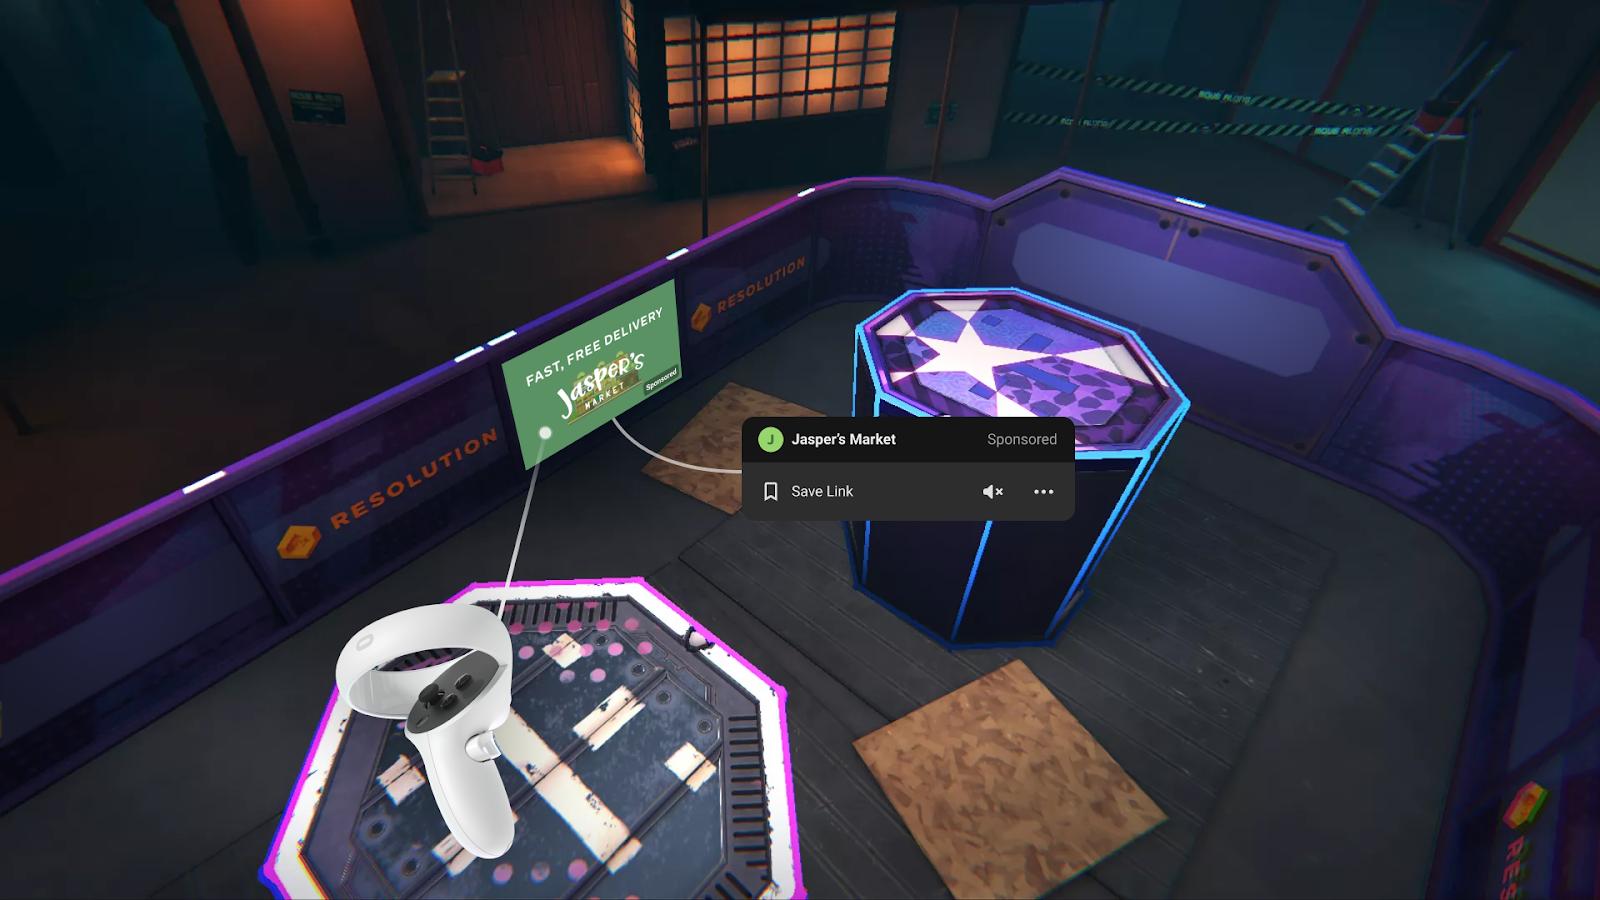 Advertisement within the Oculus Quest game Blaston.